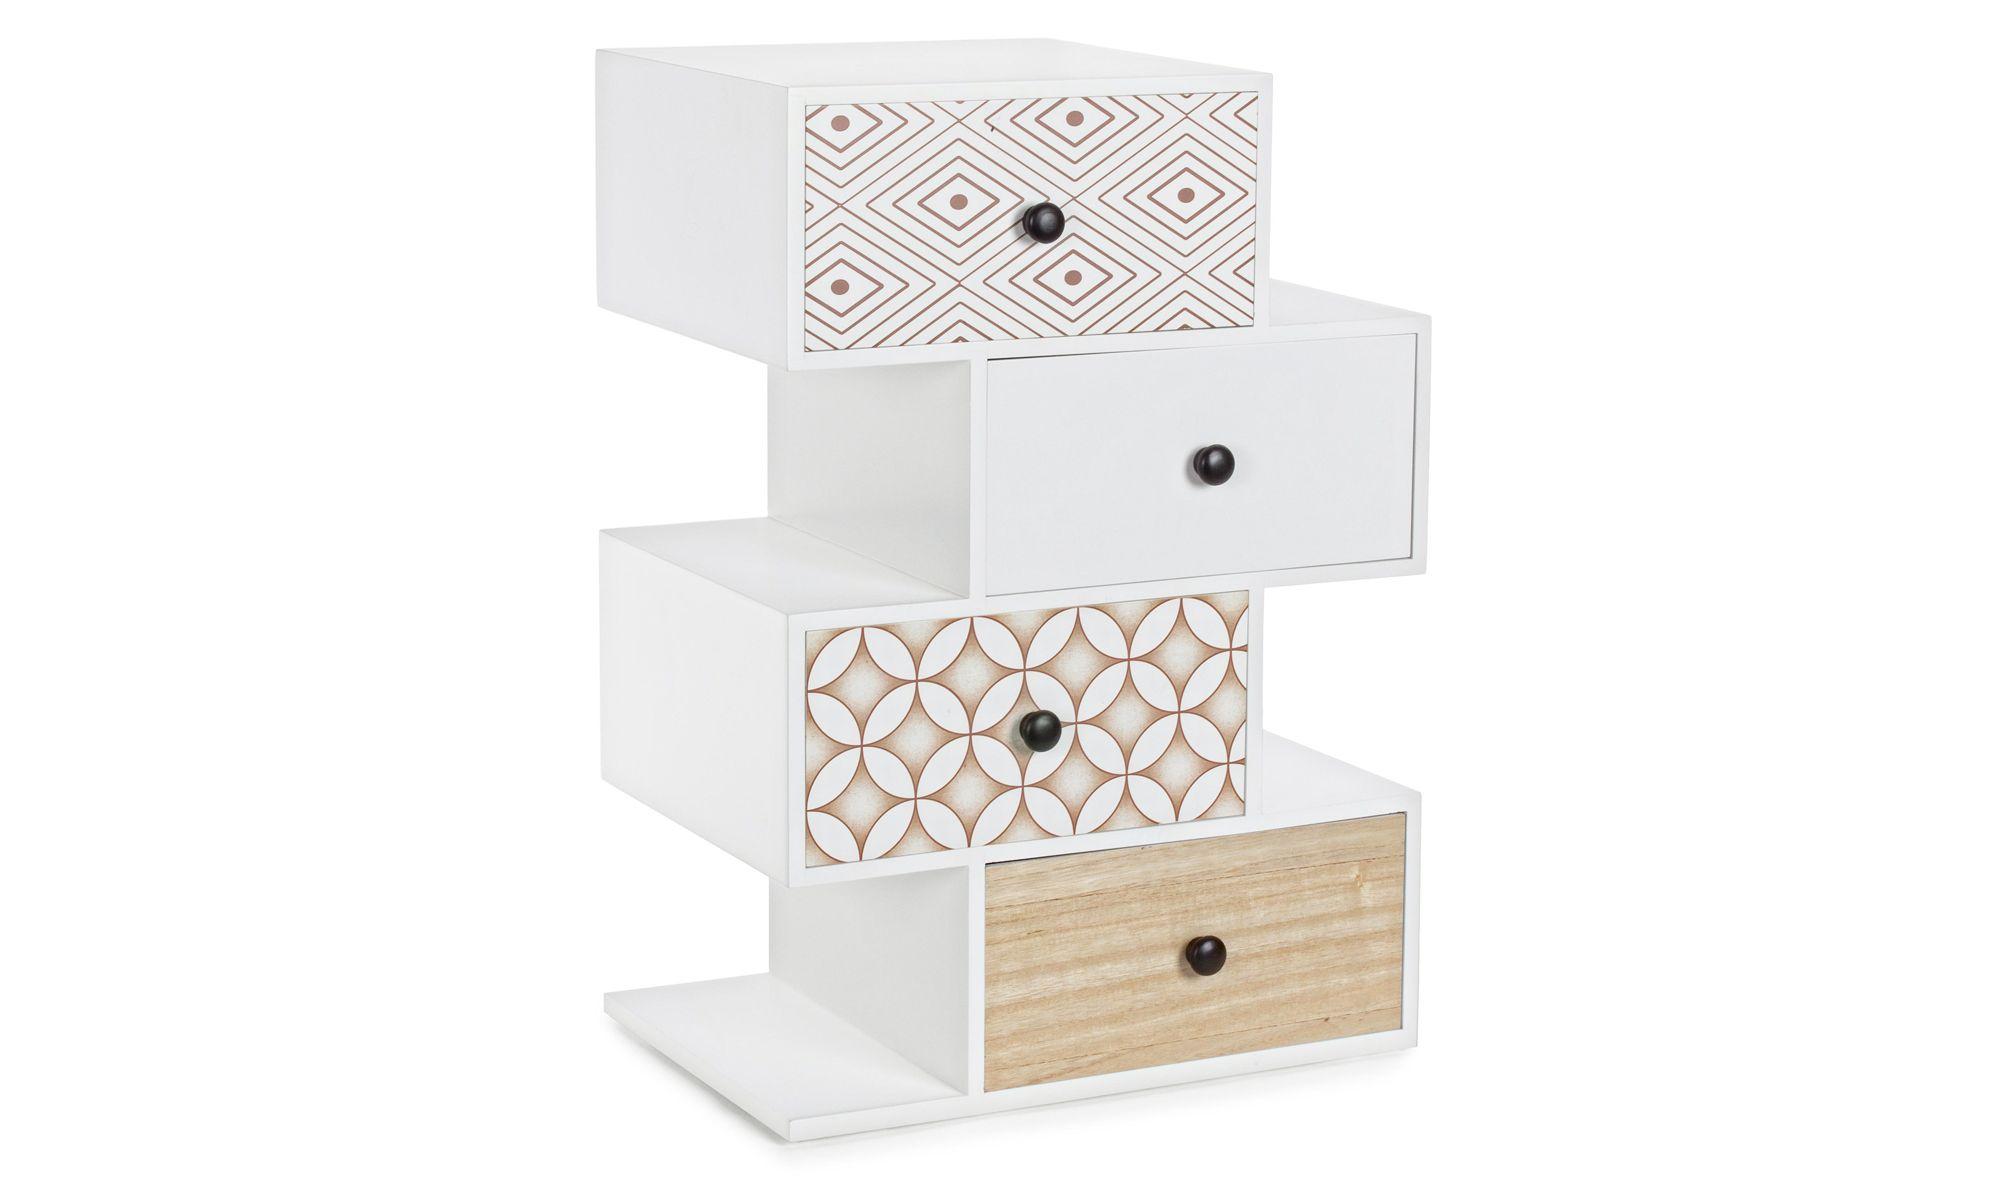 Mueble auxiliar 4 cajones realizada la estructura de DM, patas de ...